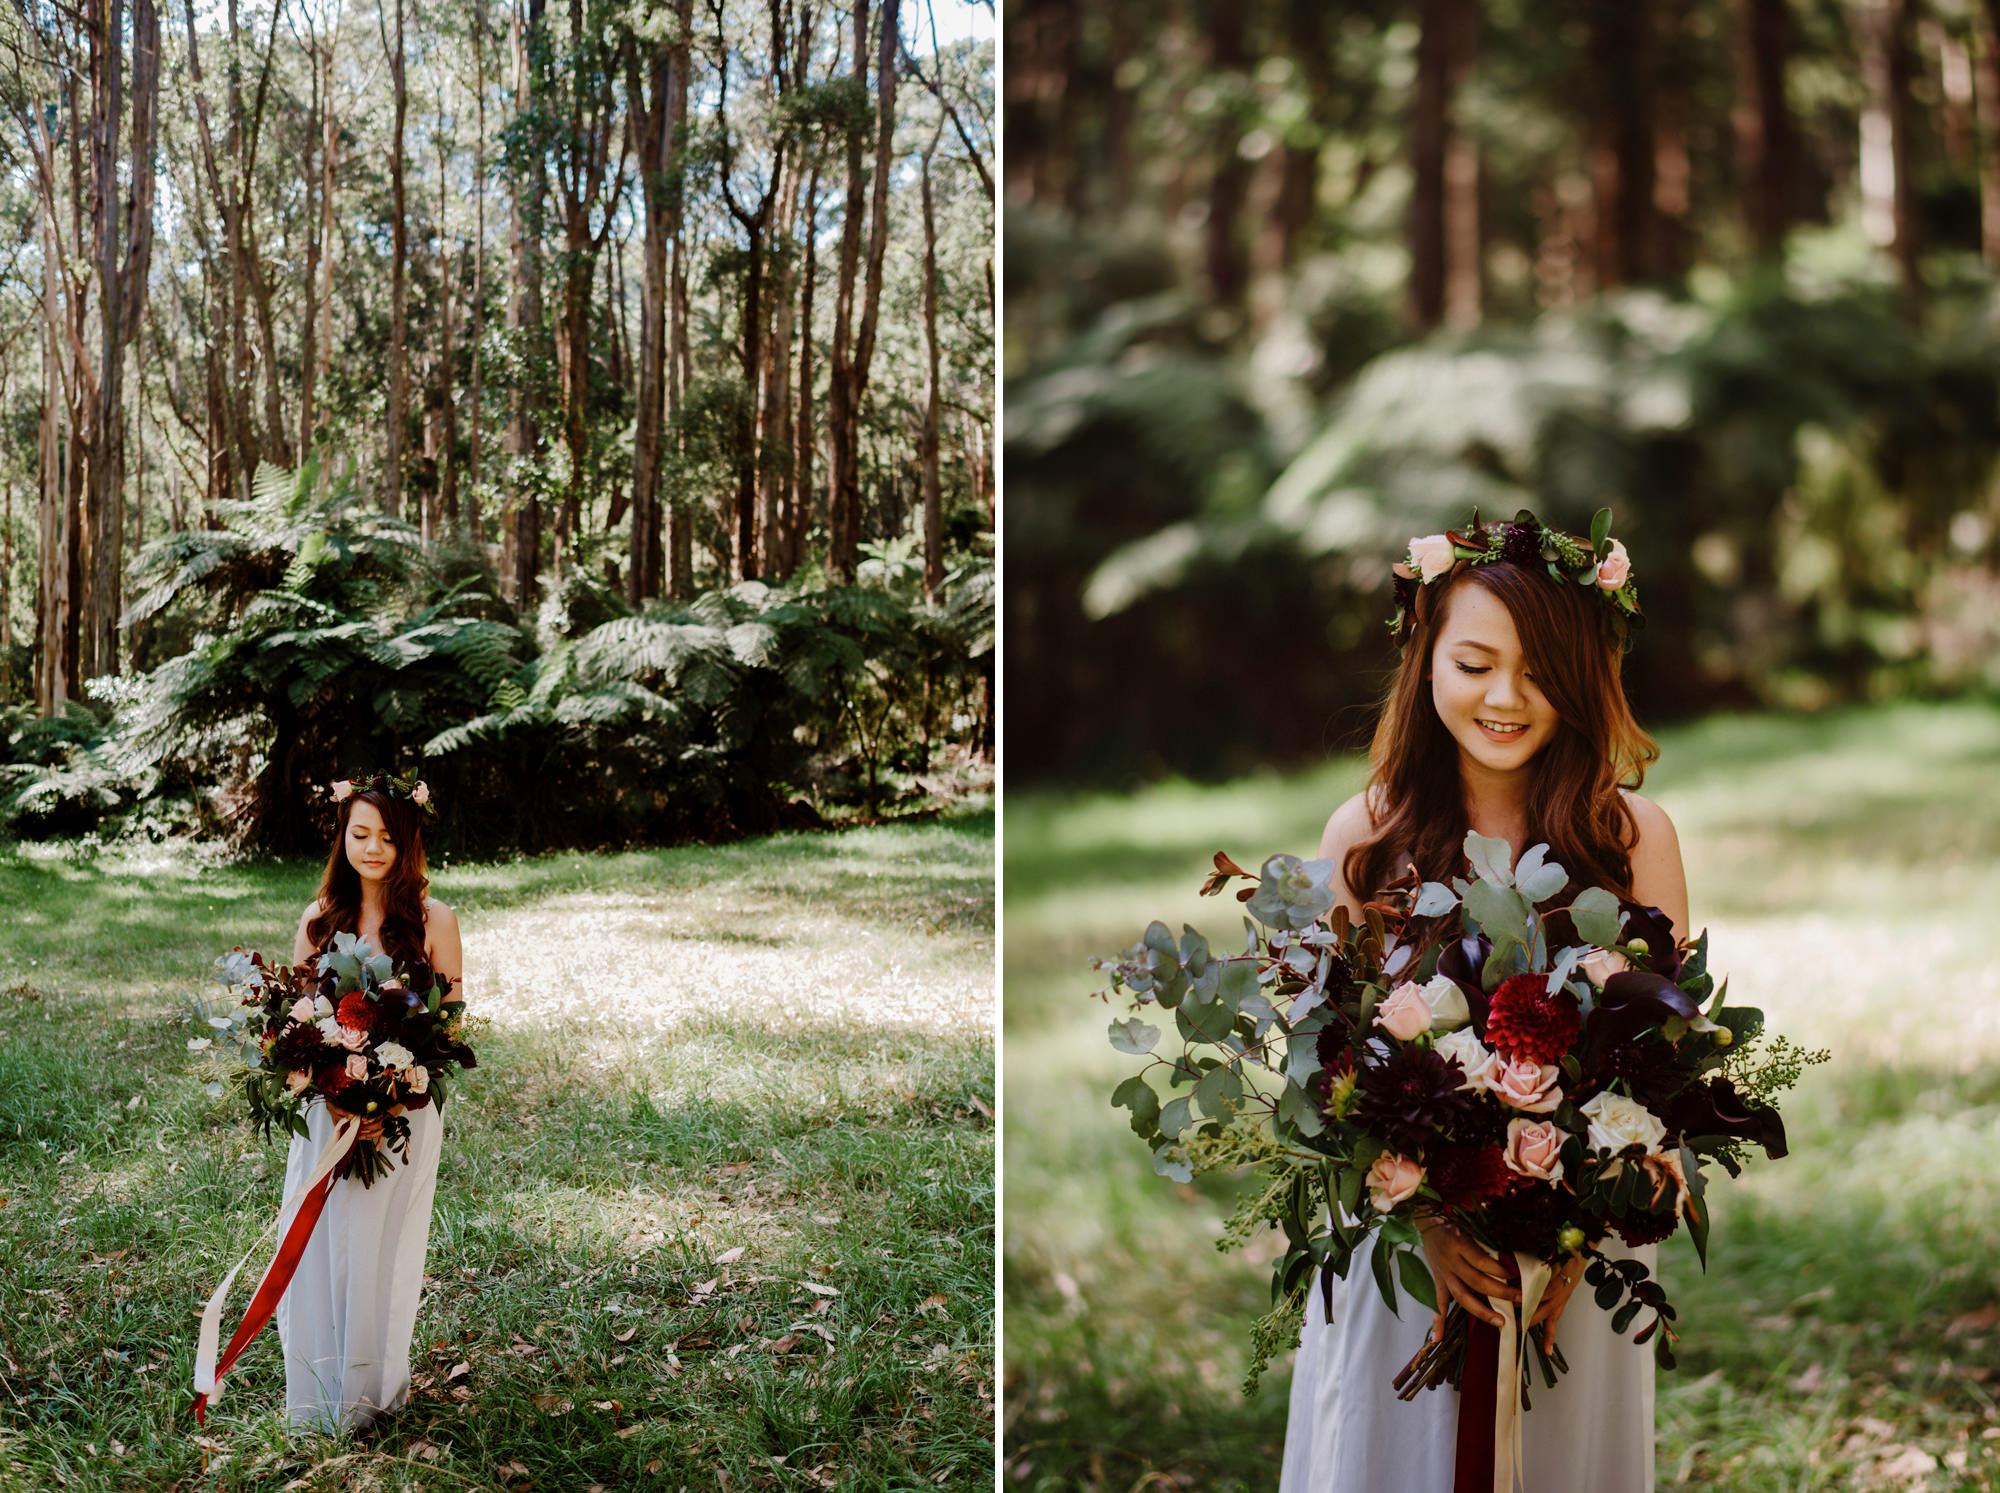 005-melbourne-engagement-wedding-photography